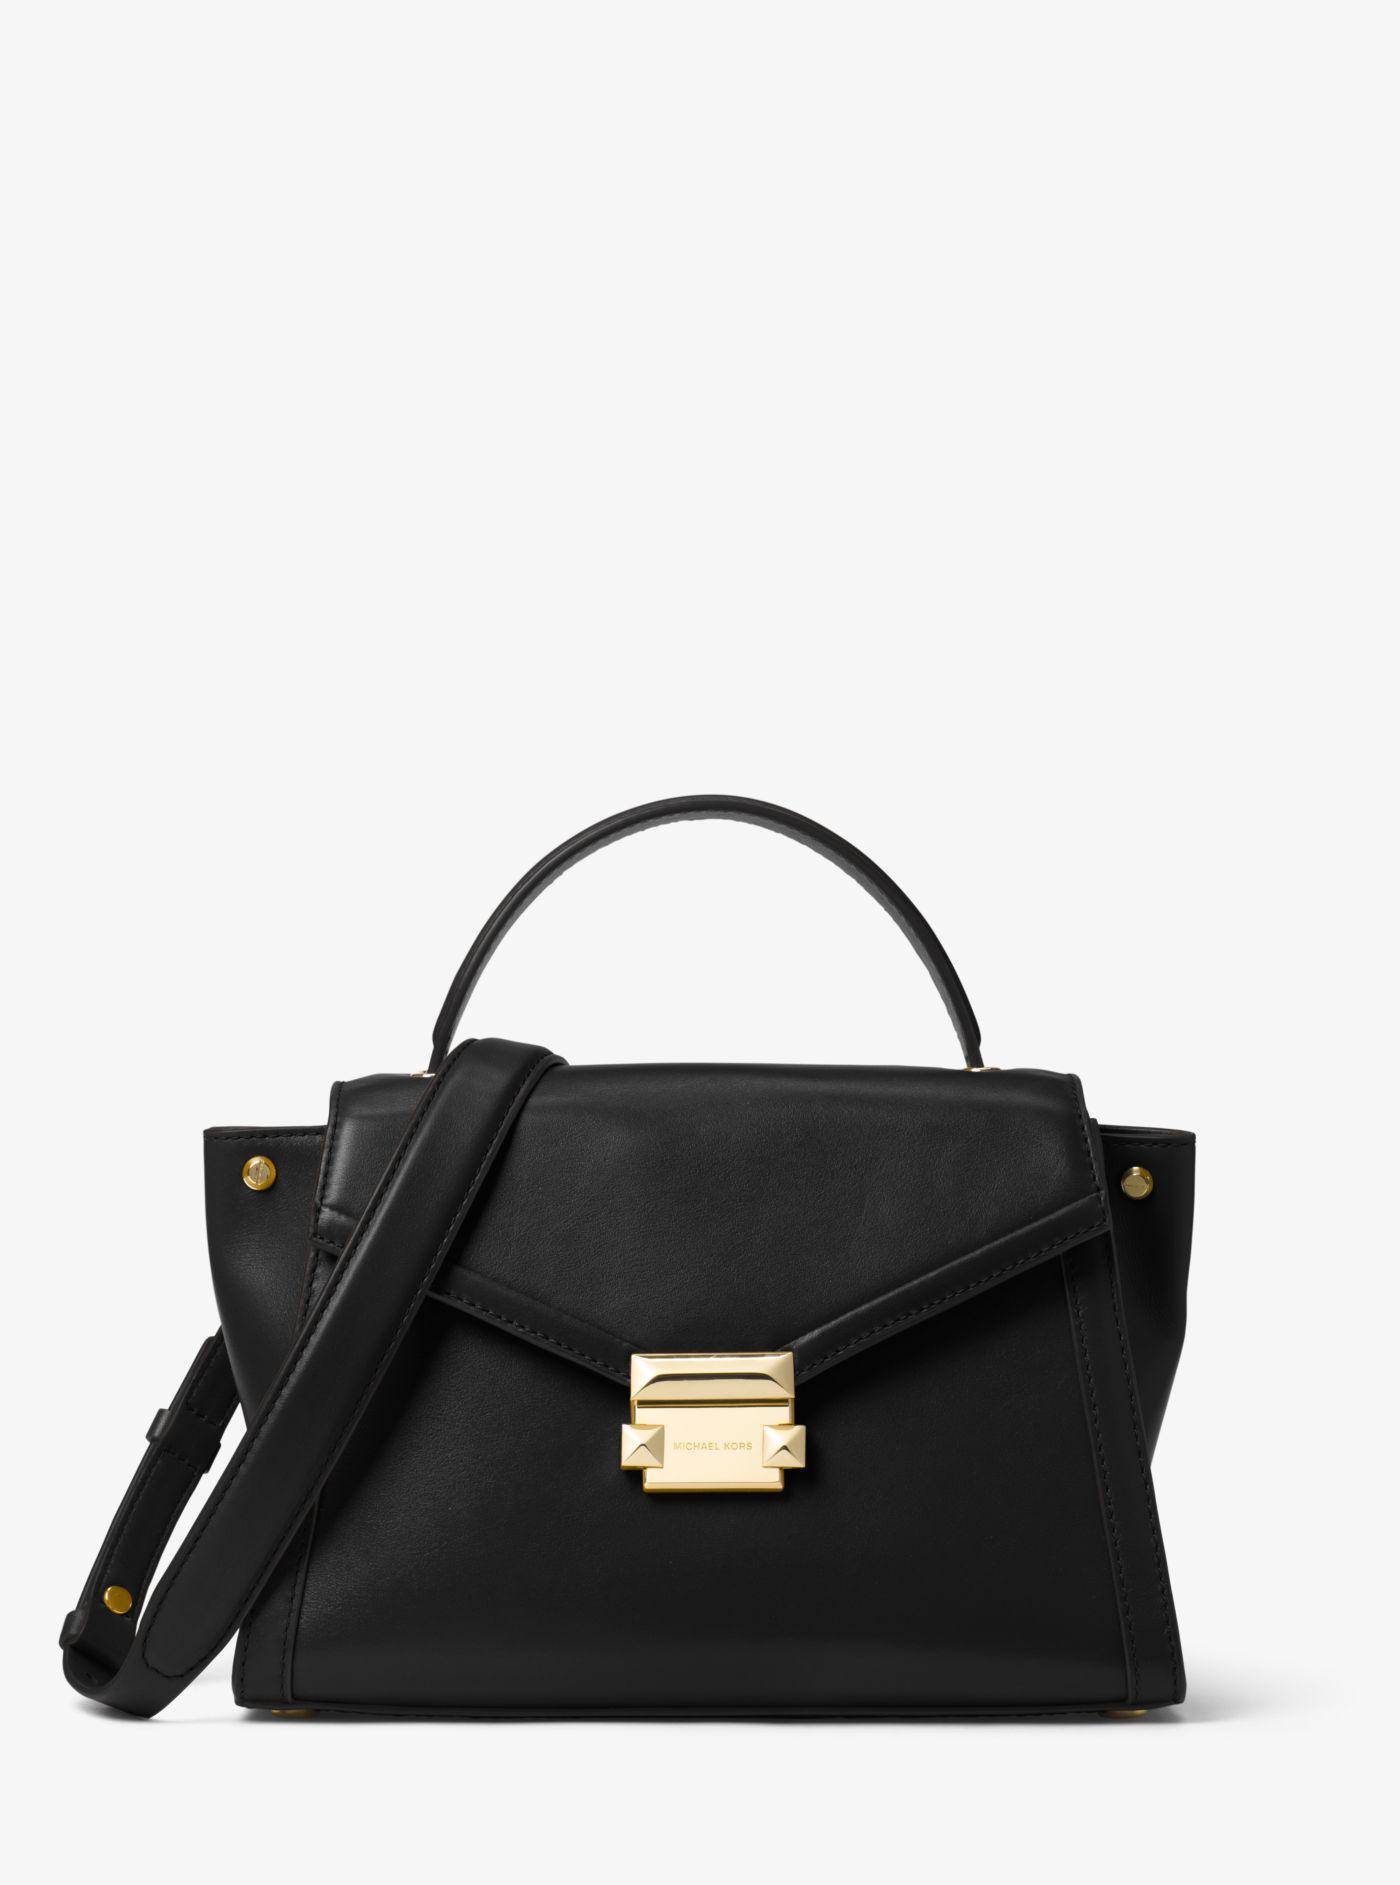 2e4554837a8d ... messenger bag in yellow e1b60 c6256  greece michael kors black whitney  medium leather satchel lyst. view fullscreen 3b352 ef769